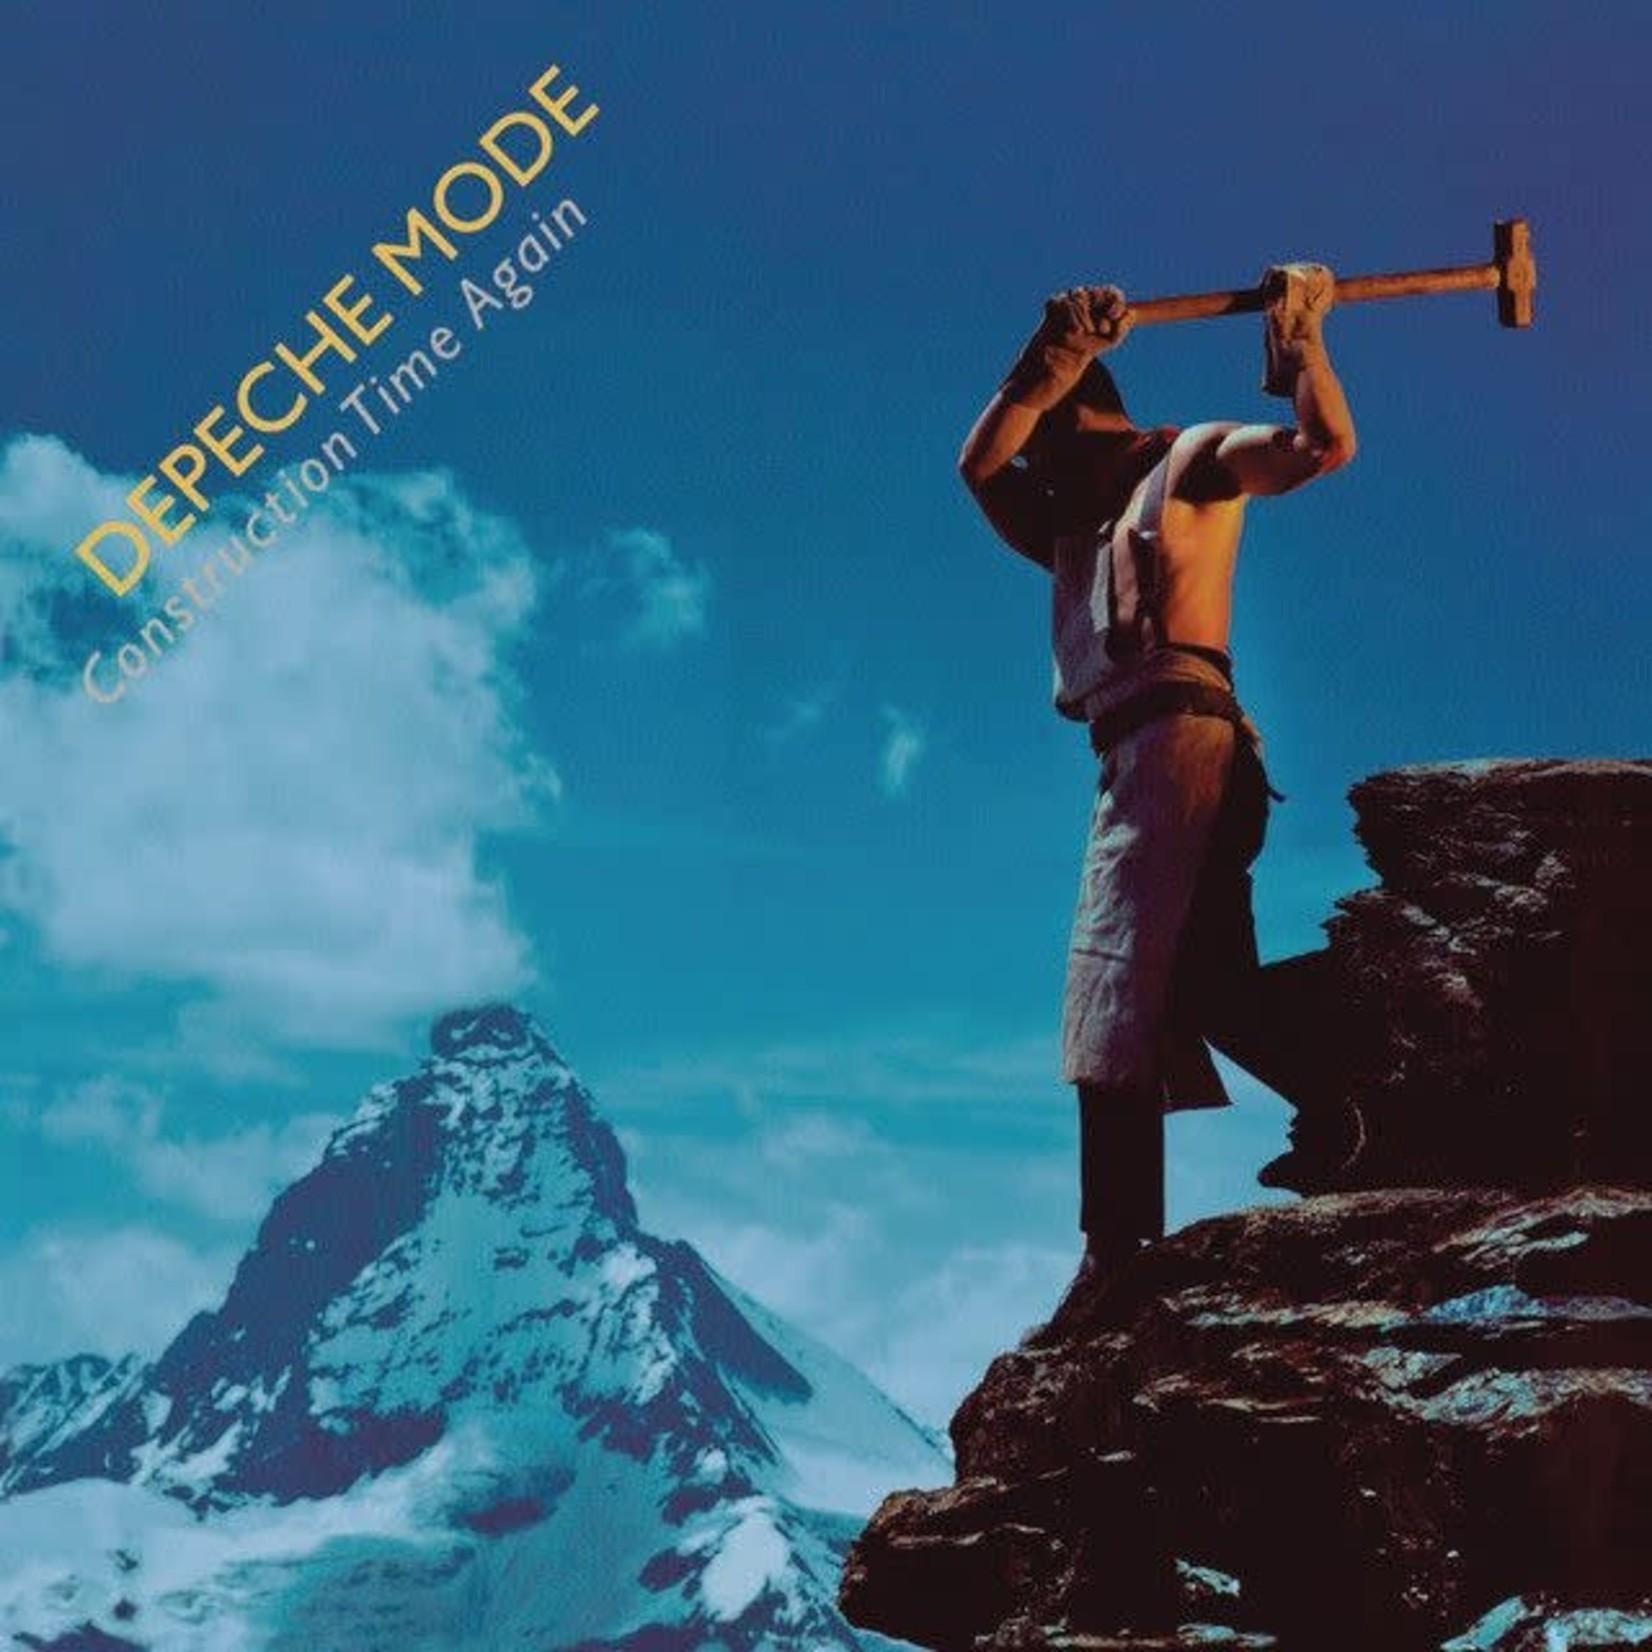 Vinyl Depeche Mode - Construction Time Again (UK)